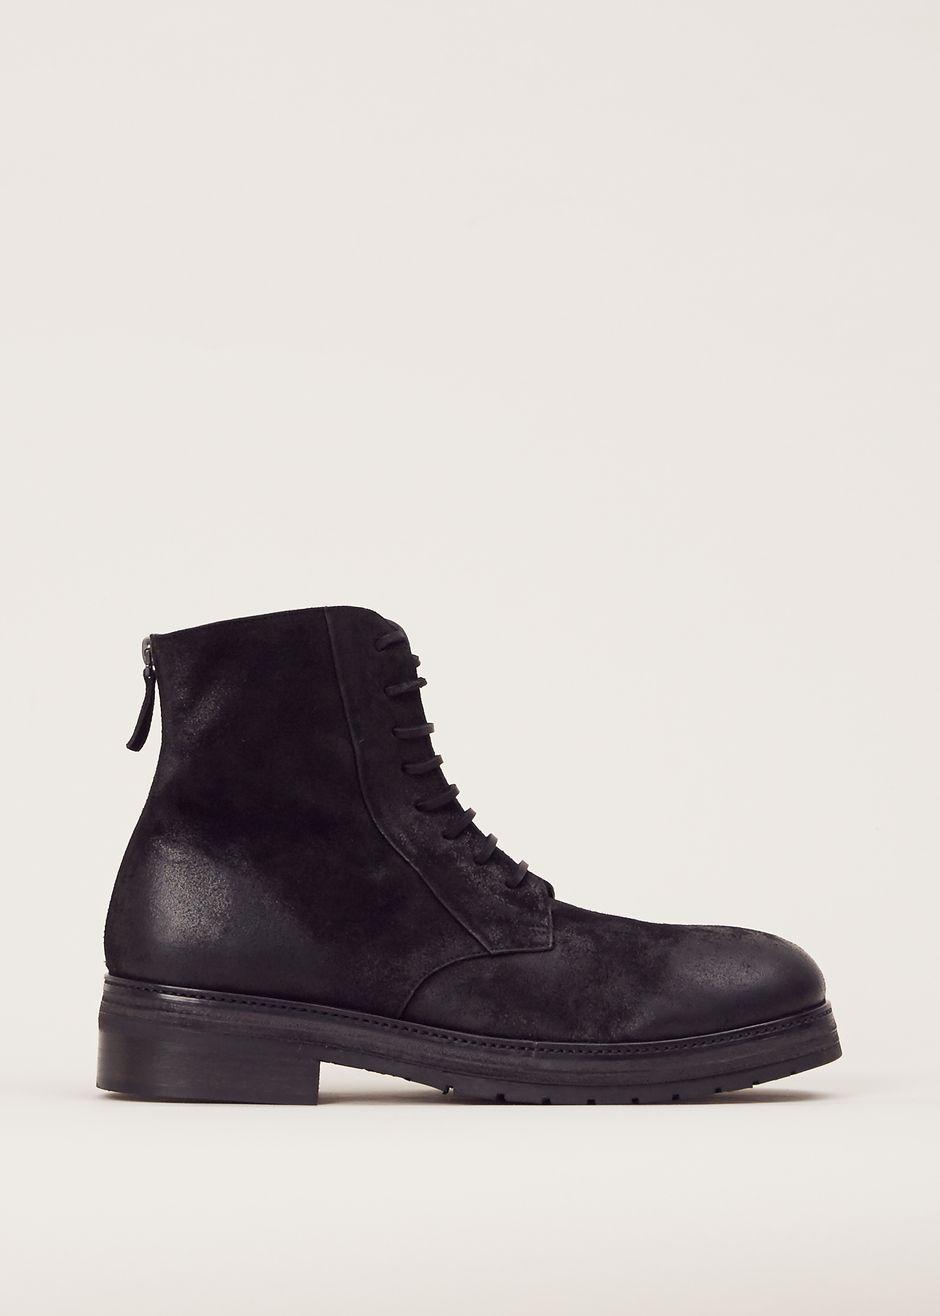 Marsell Zucchino Lace Up Boot (Black)